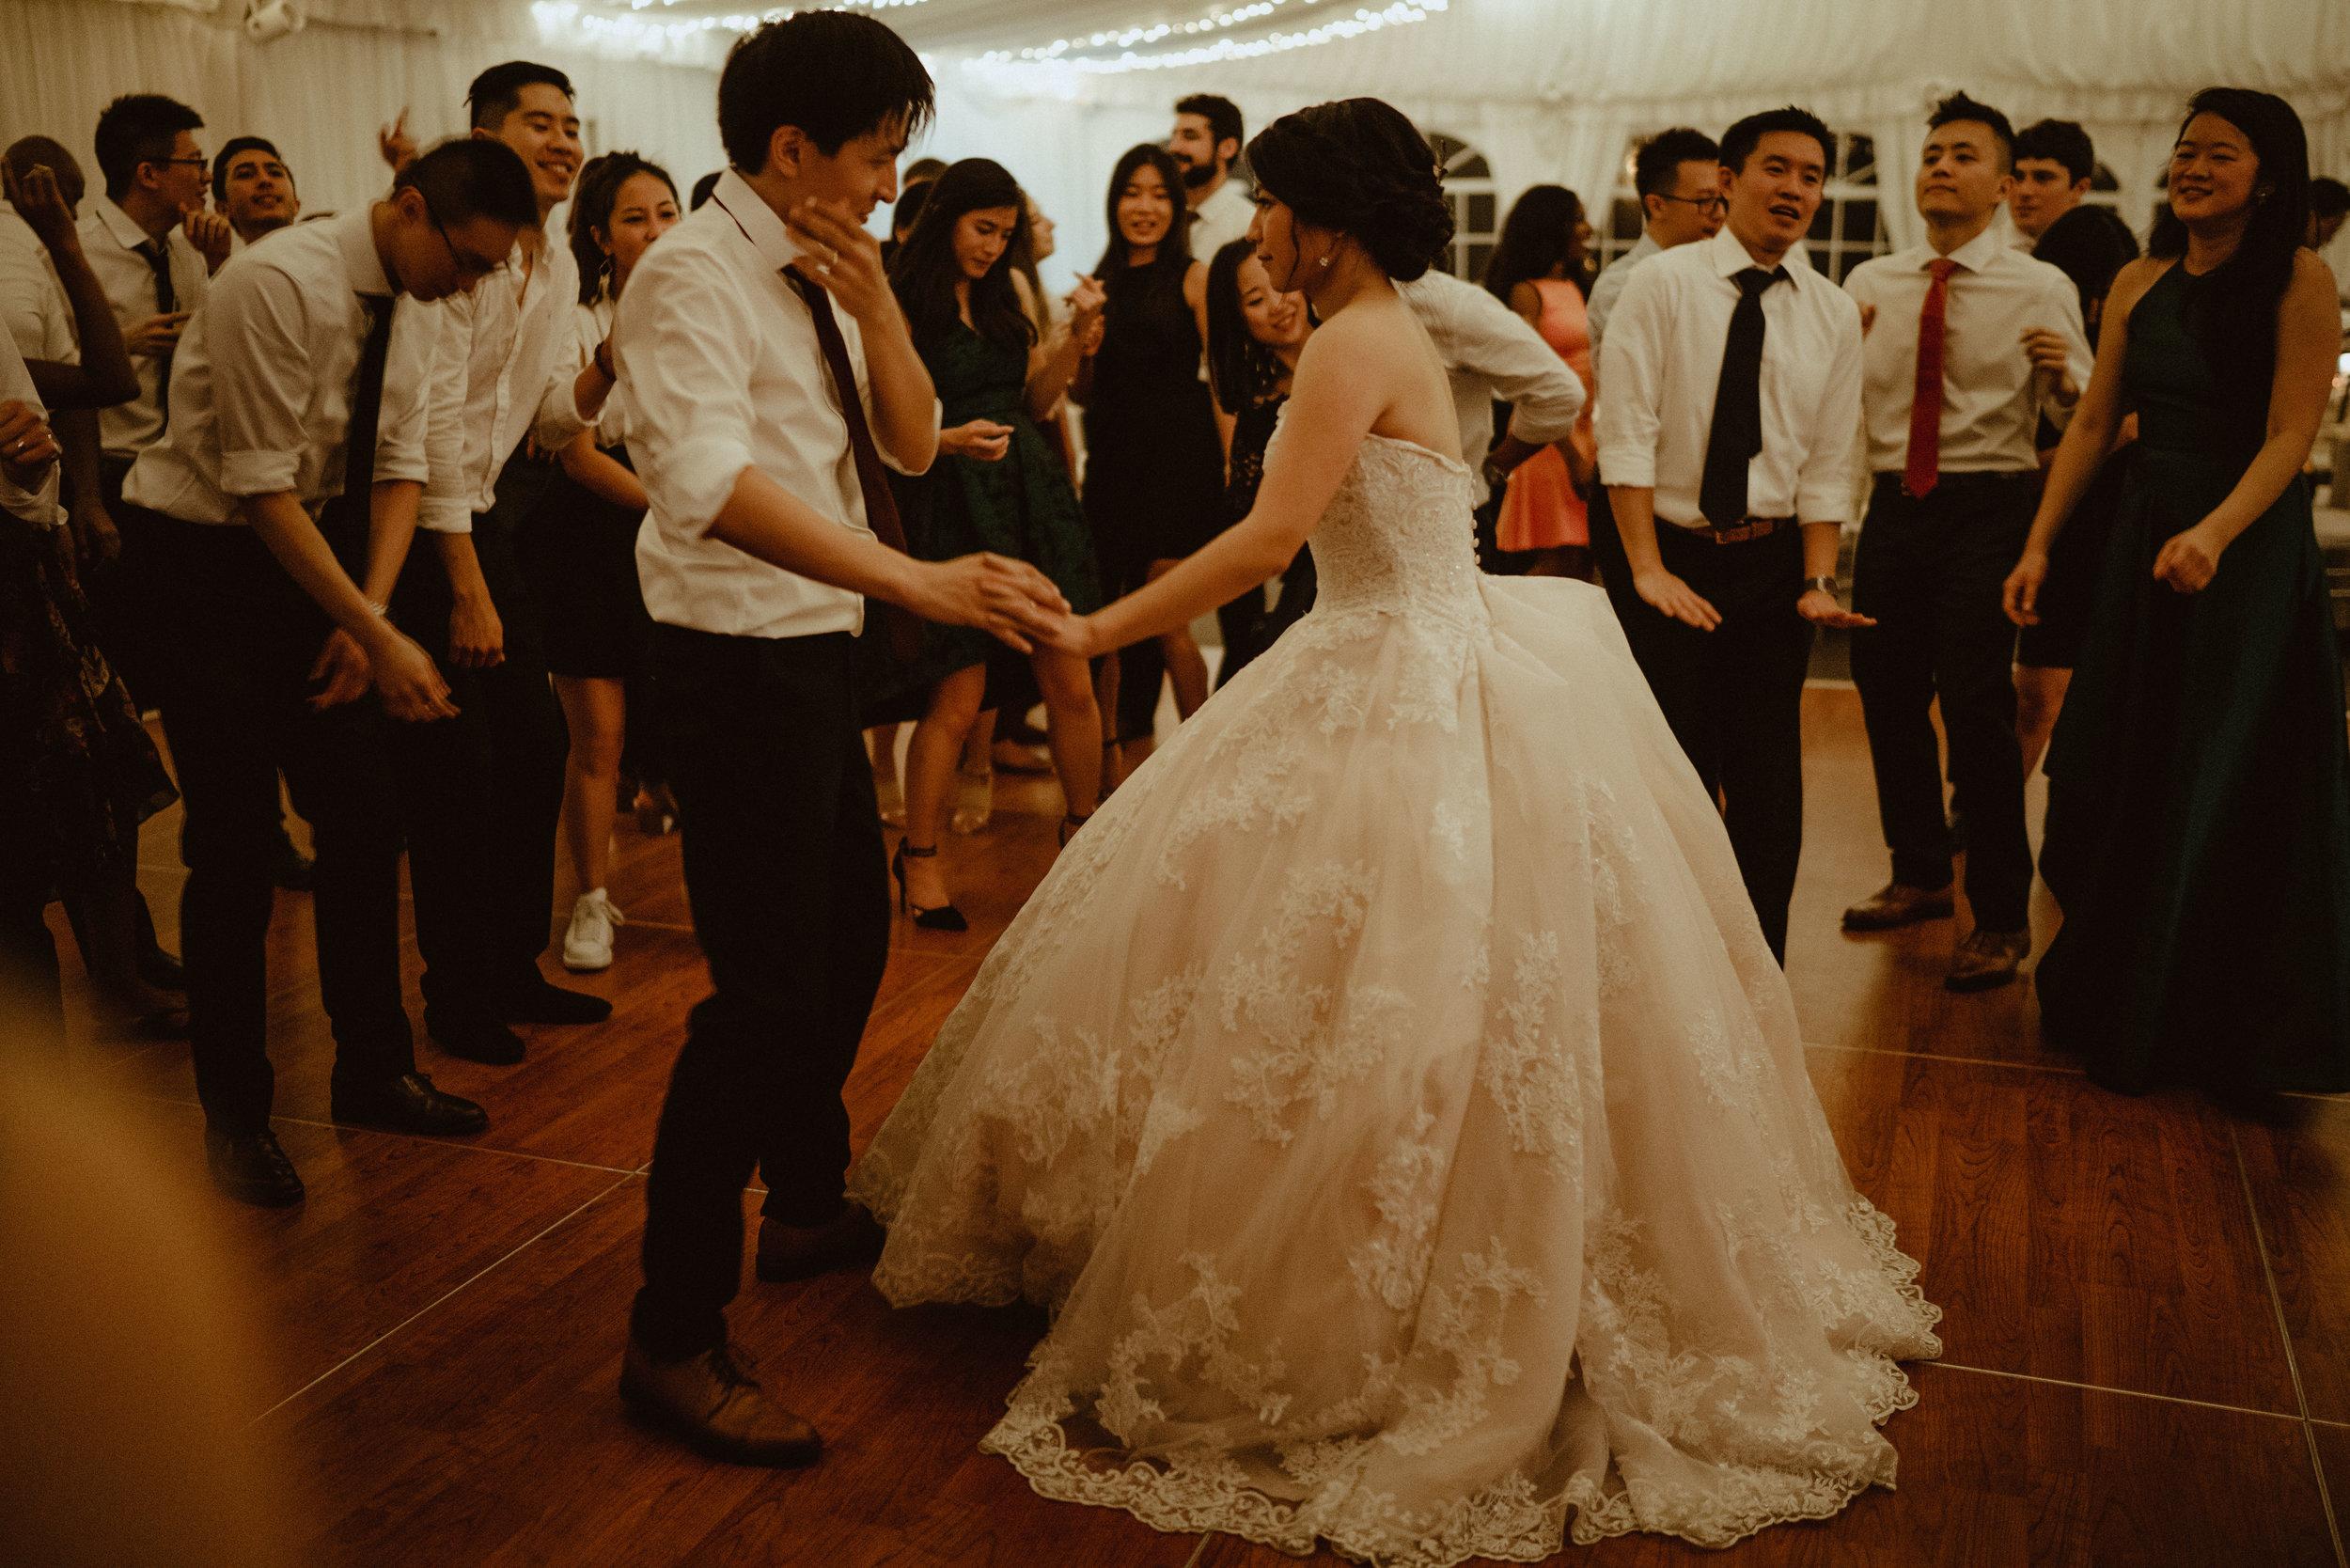 Irene-and-Jae-2019_Brooklyn_Wedding_Photographer_Chellise_Michael_Photography--181.jpg